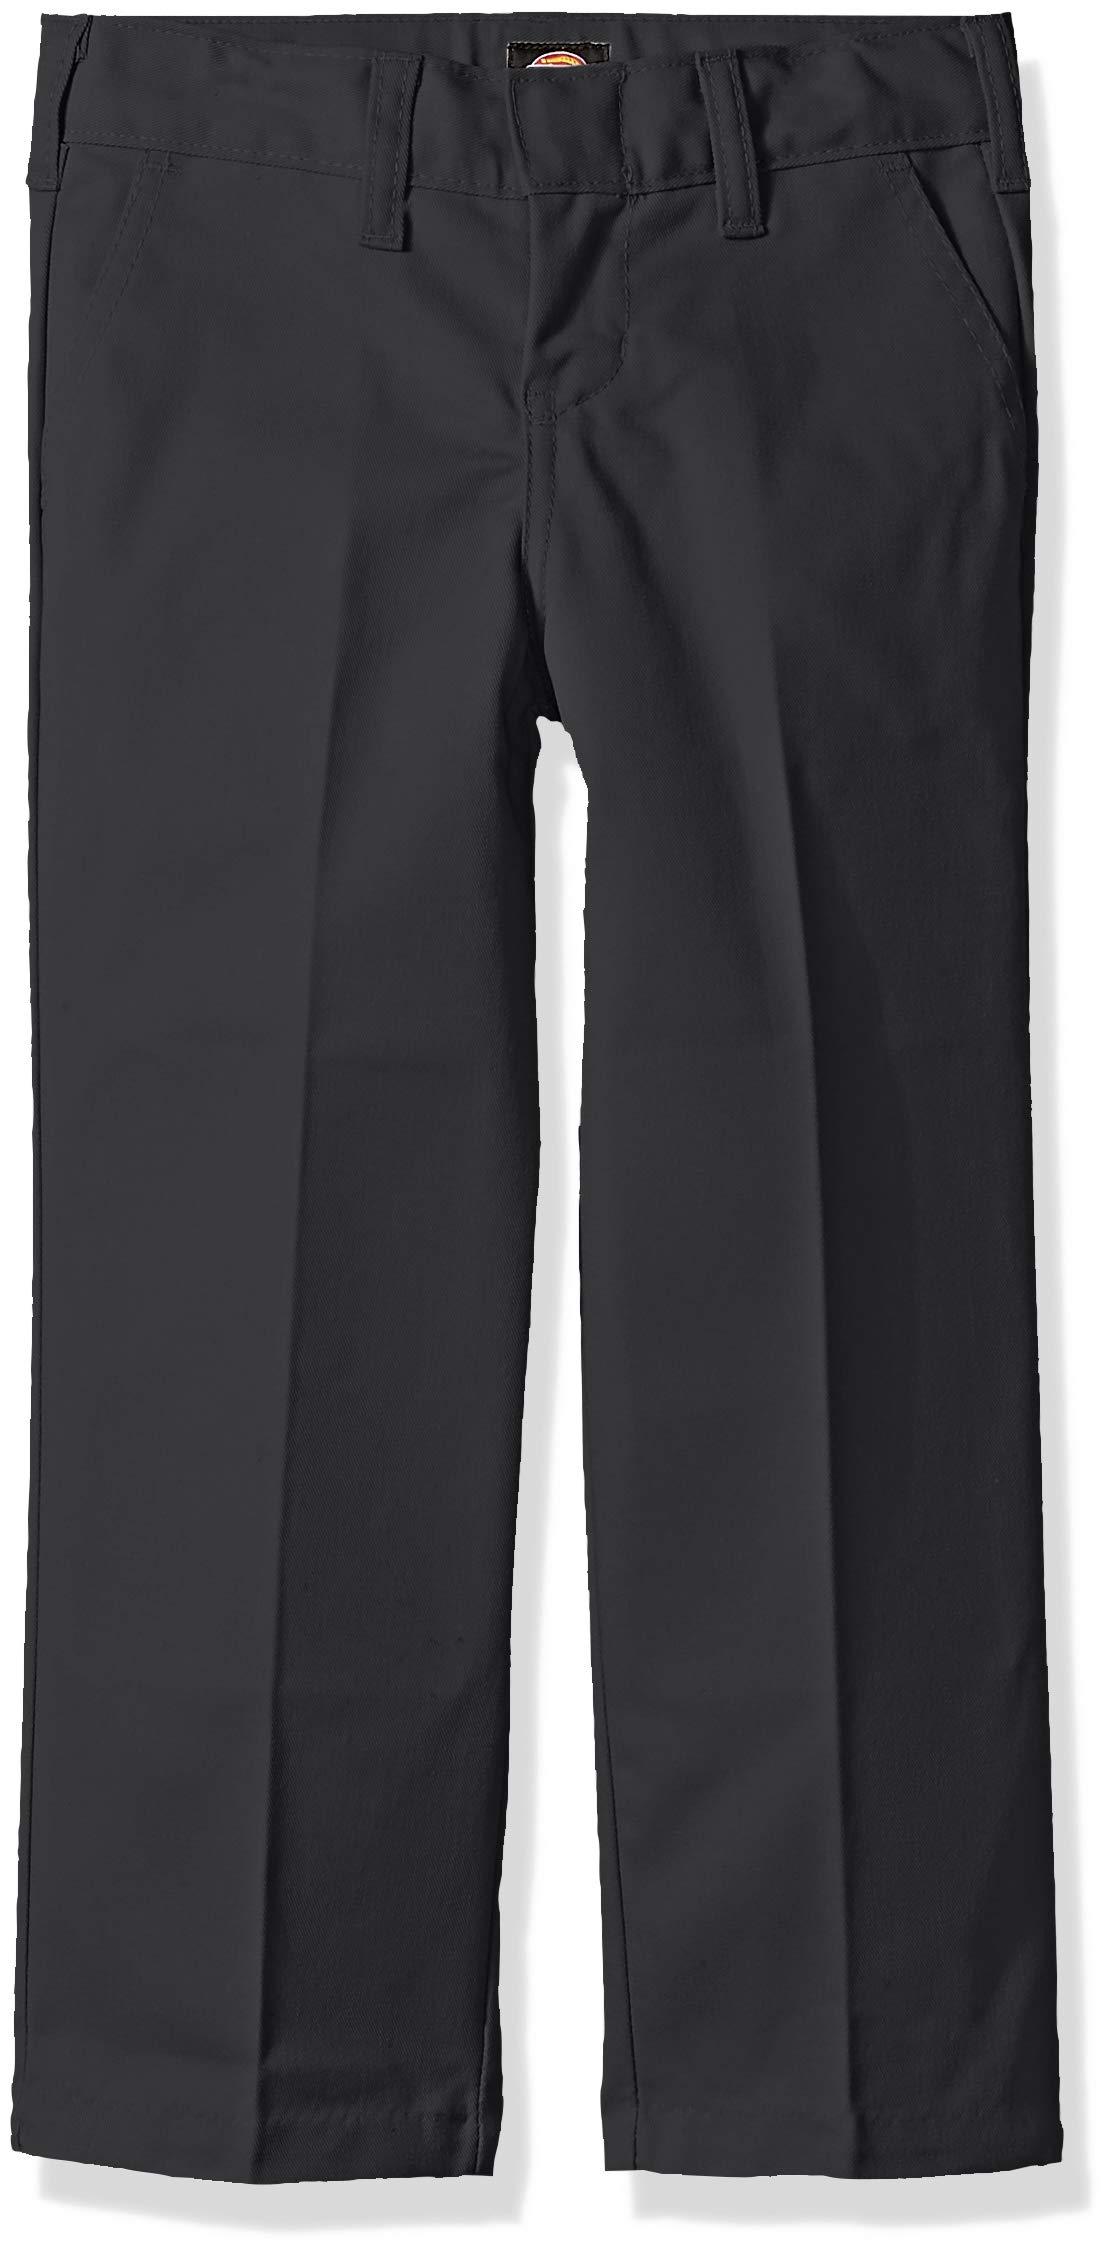 Dickies Kids Boys' Big Flexwaist Flat Front Straight Leg Pant, Charcoal, 10 Husky